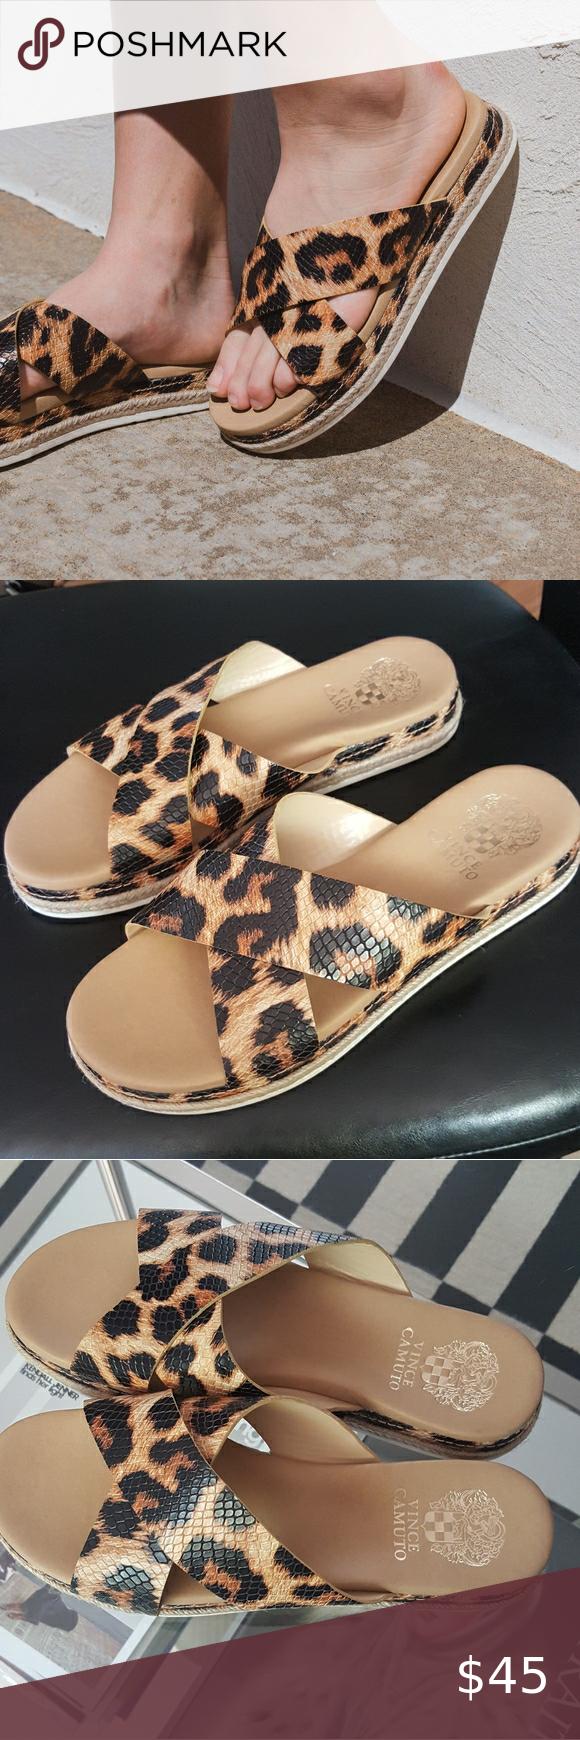 Vince Camuto Rickert Leopard Slide Sandals Vince Camuto leopard sandals great condition size 8.5 Vince Camuto Shoes Sandals